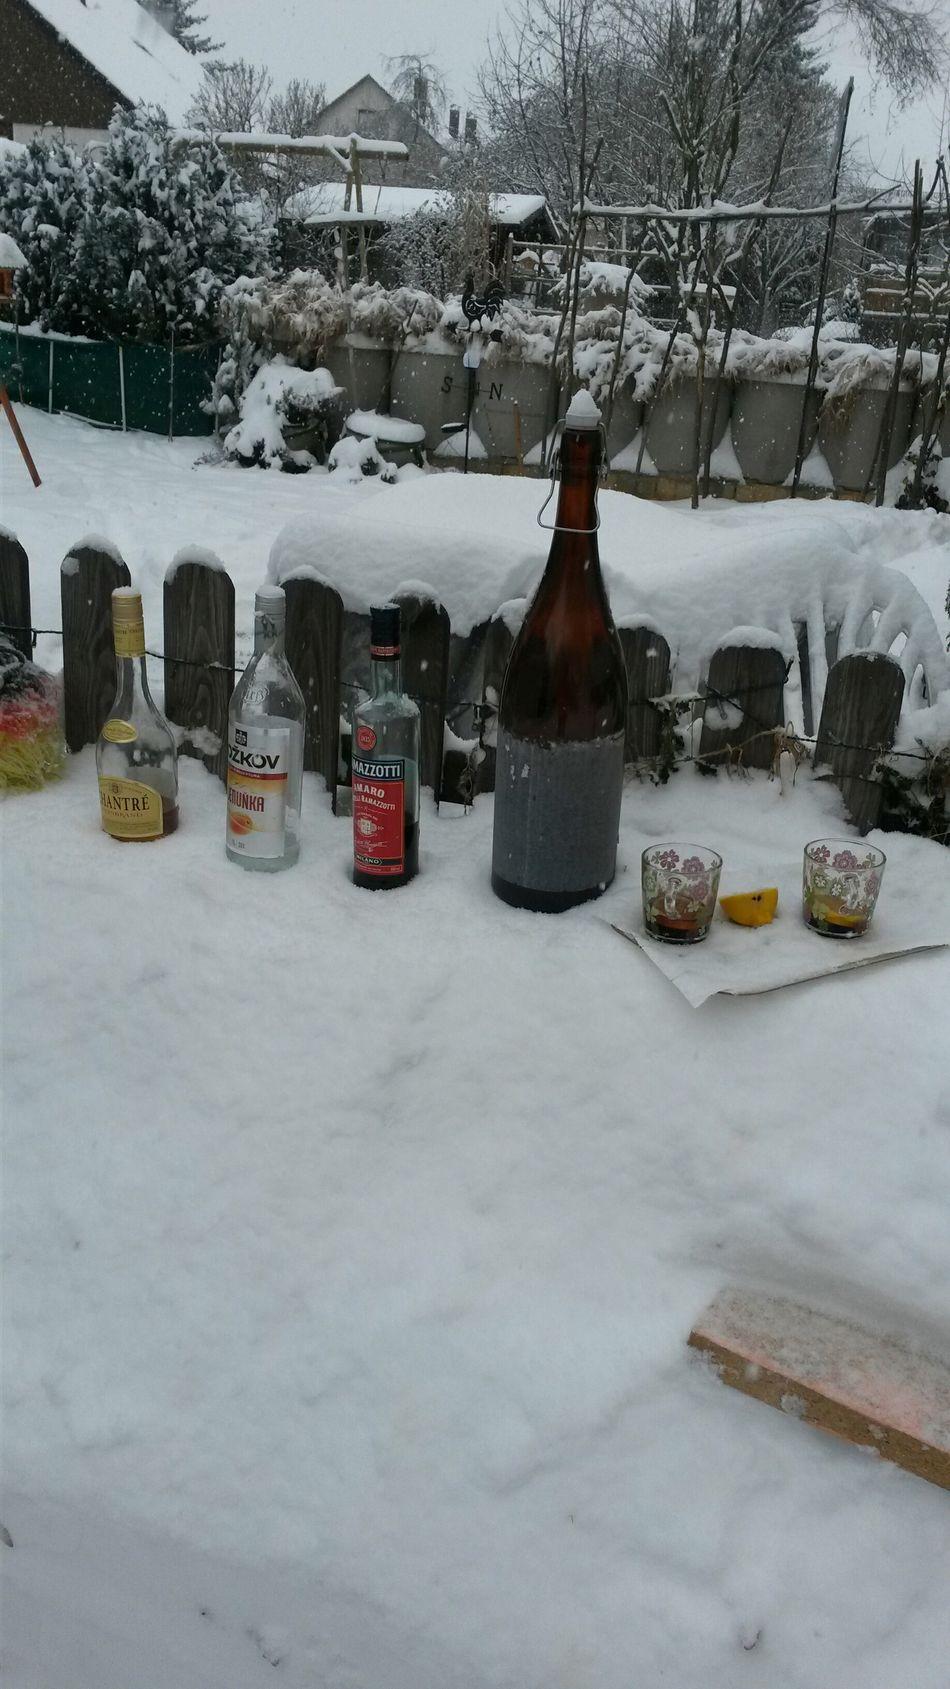 Schnee paar einweihunh 2014.30.12 Relaxing